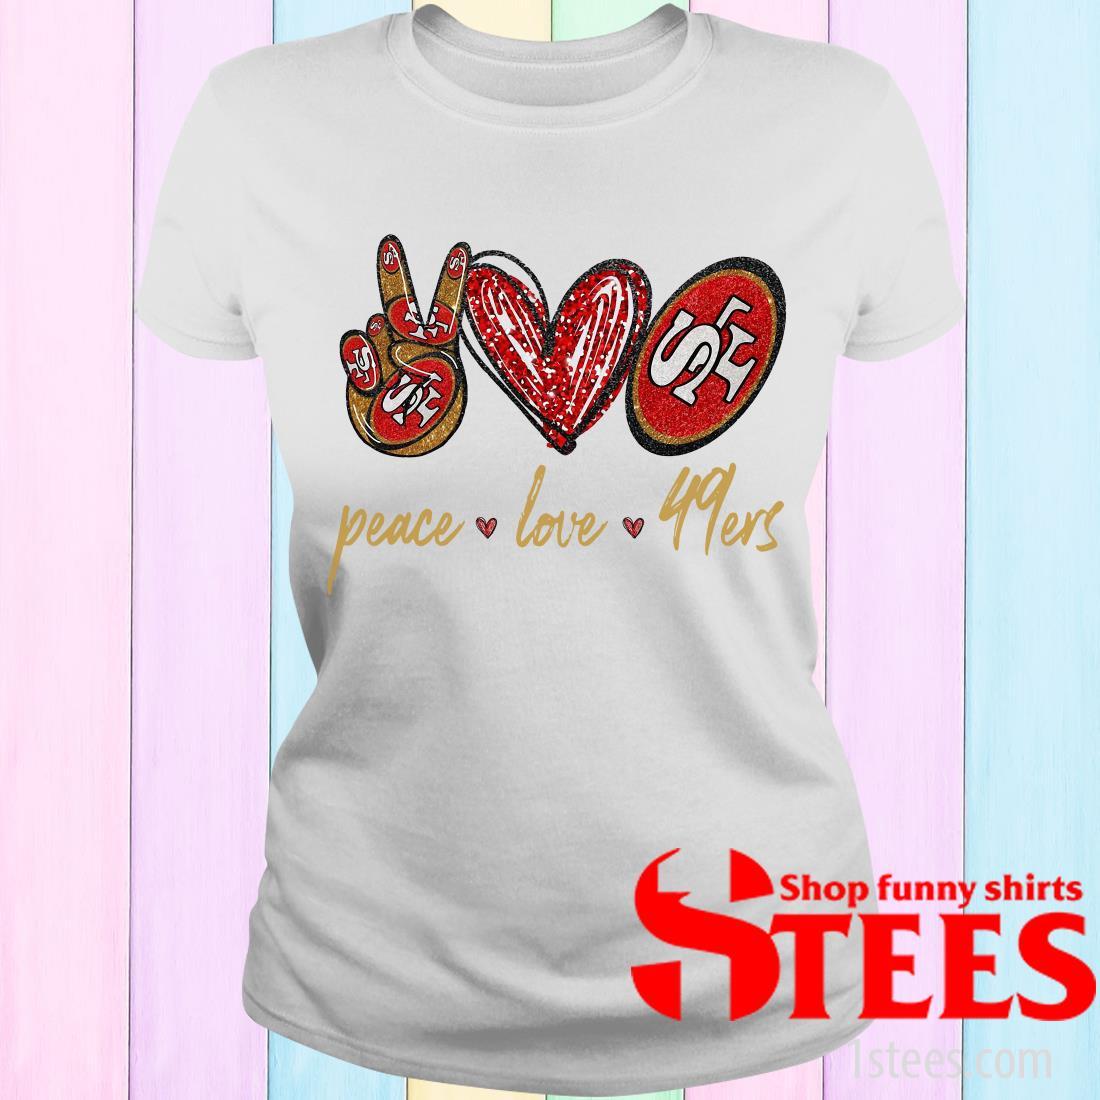 Peace Love San Francisco 49ers Women's T-Shirt